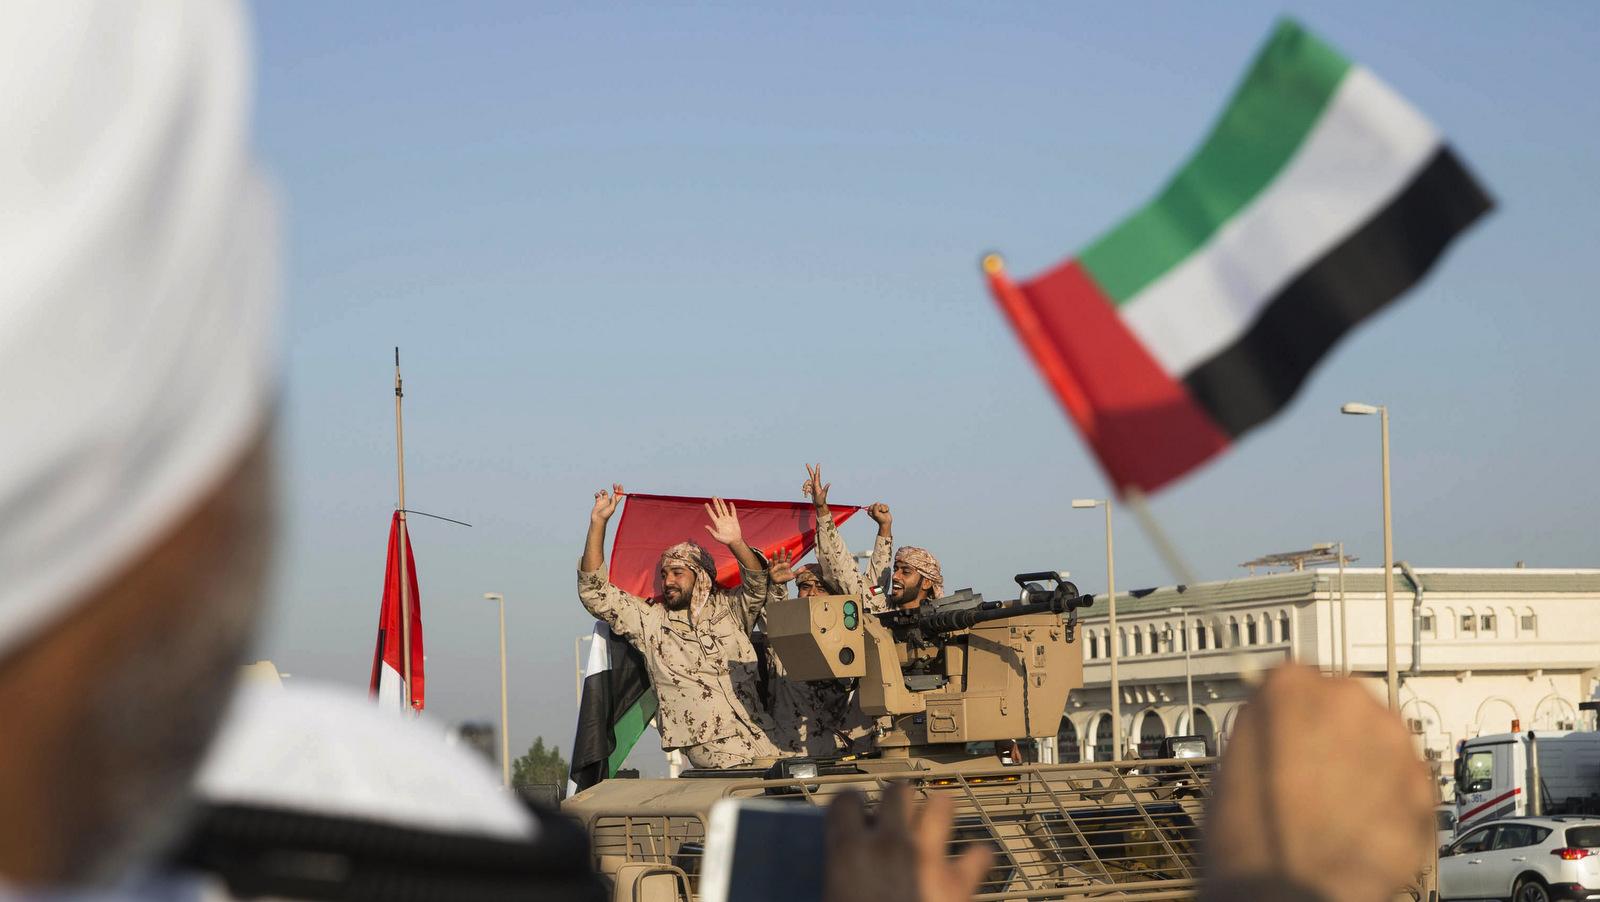 Hodeidah Bombardment Reveals UAE's US-Backed Rise in Regional Power